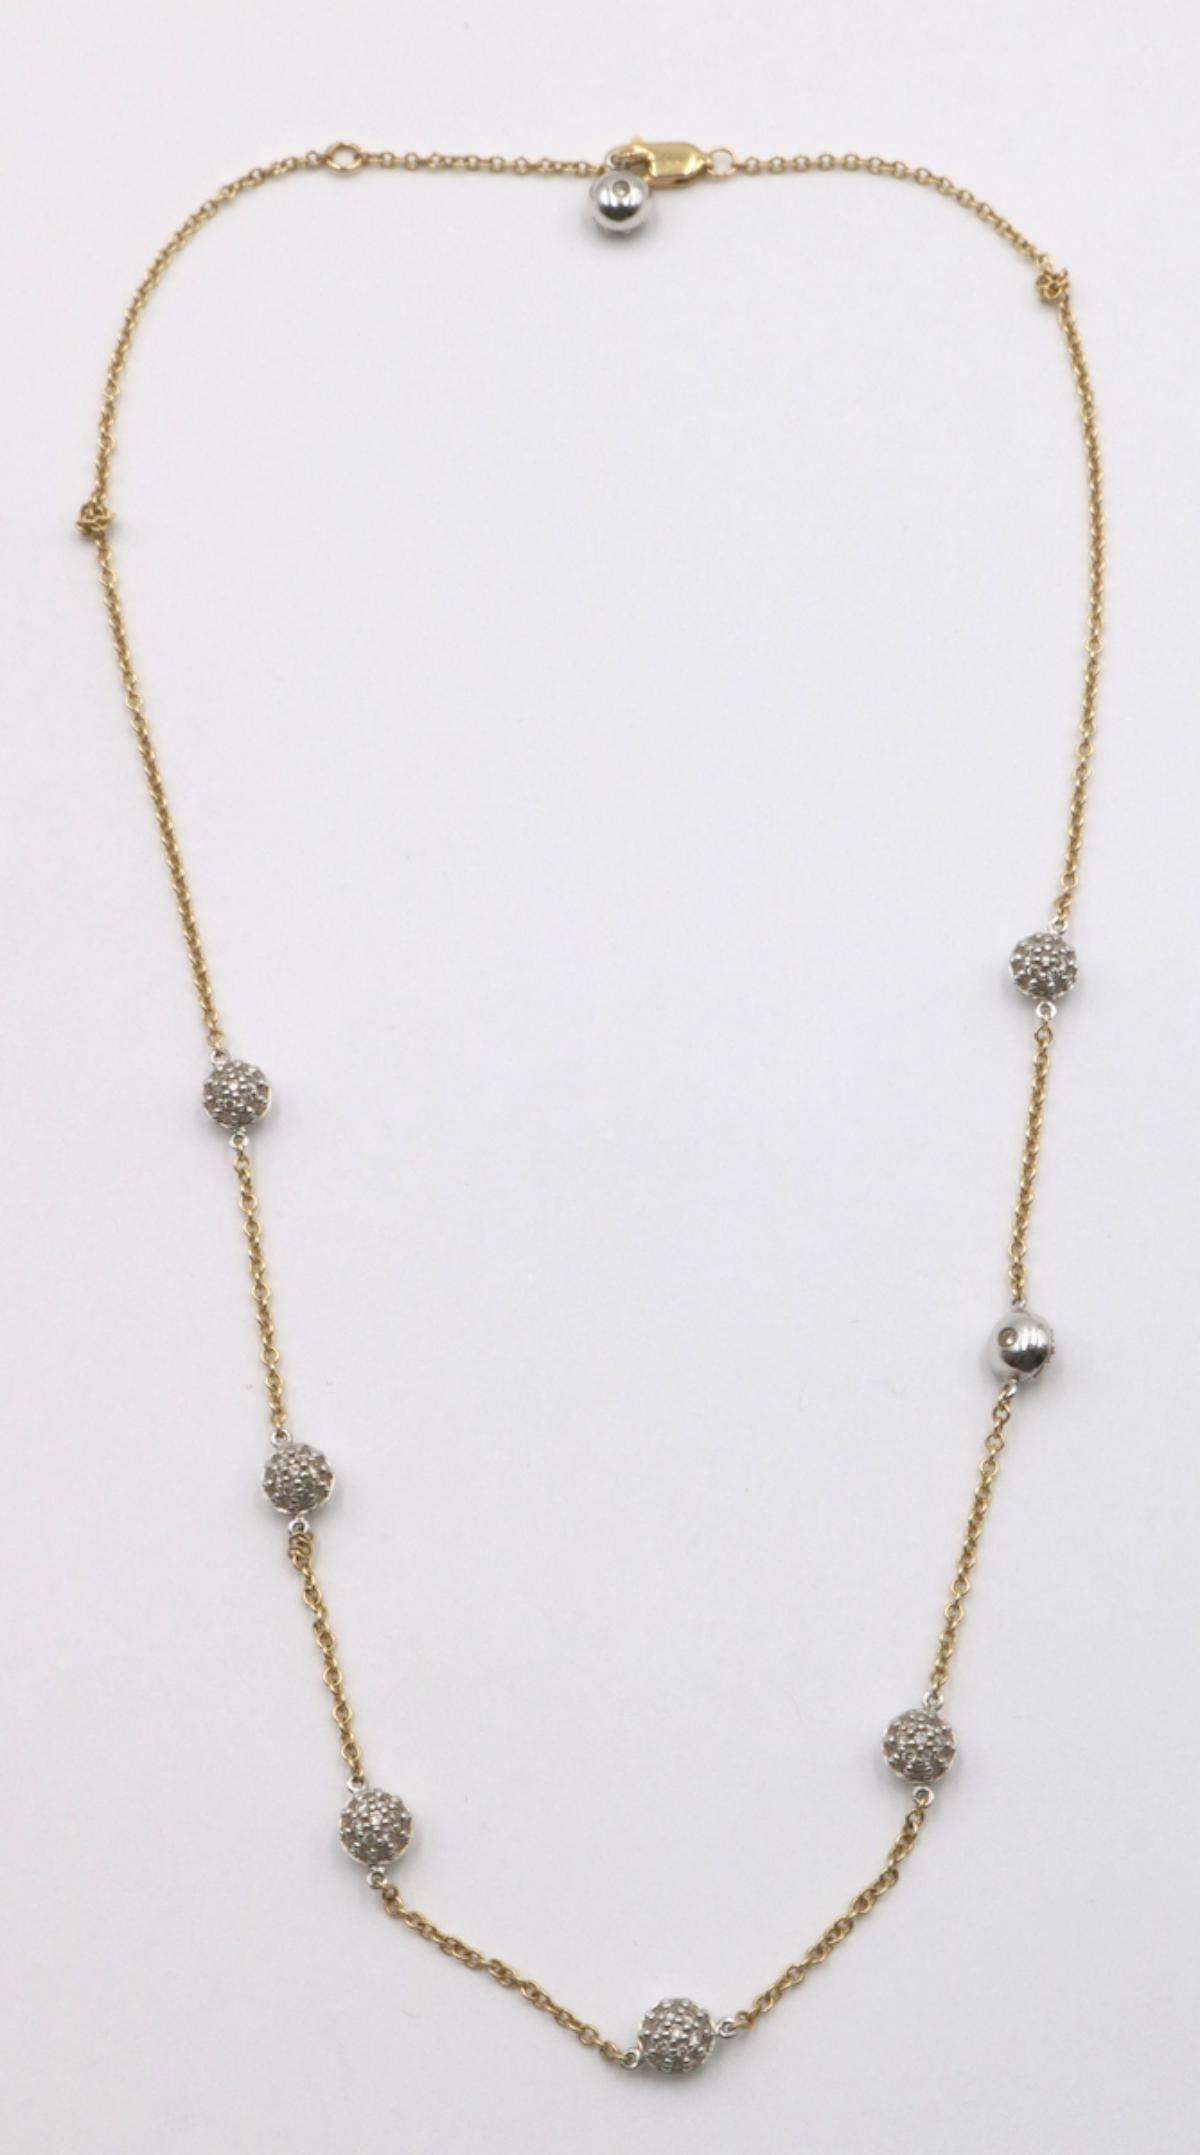 Sonia B 14Kt Diamond Ball Two-Tone Necklace